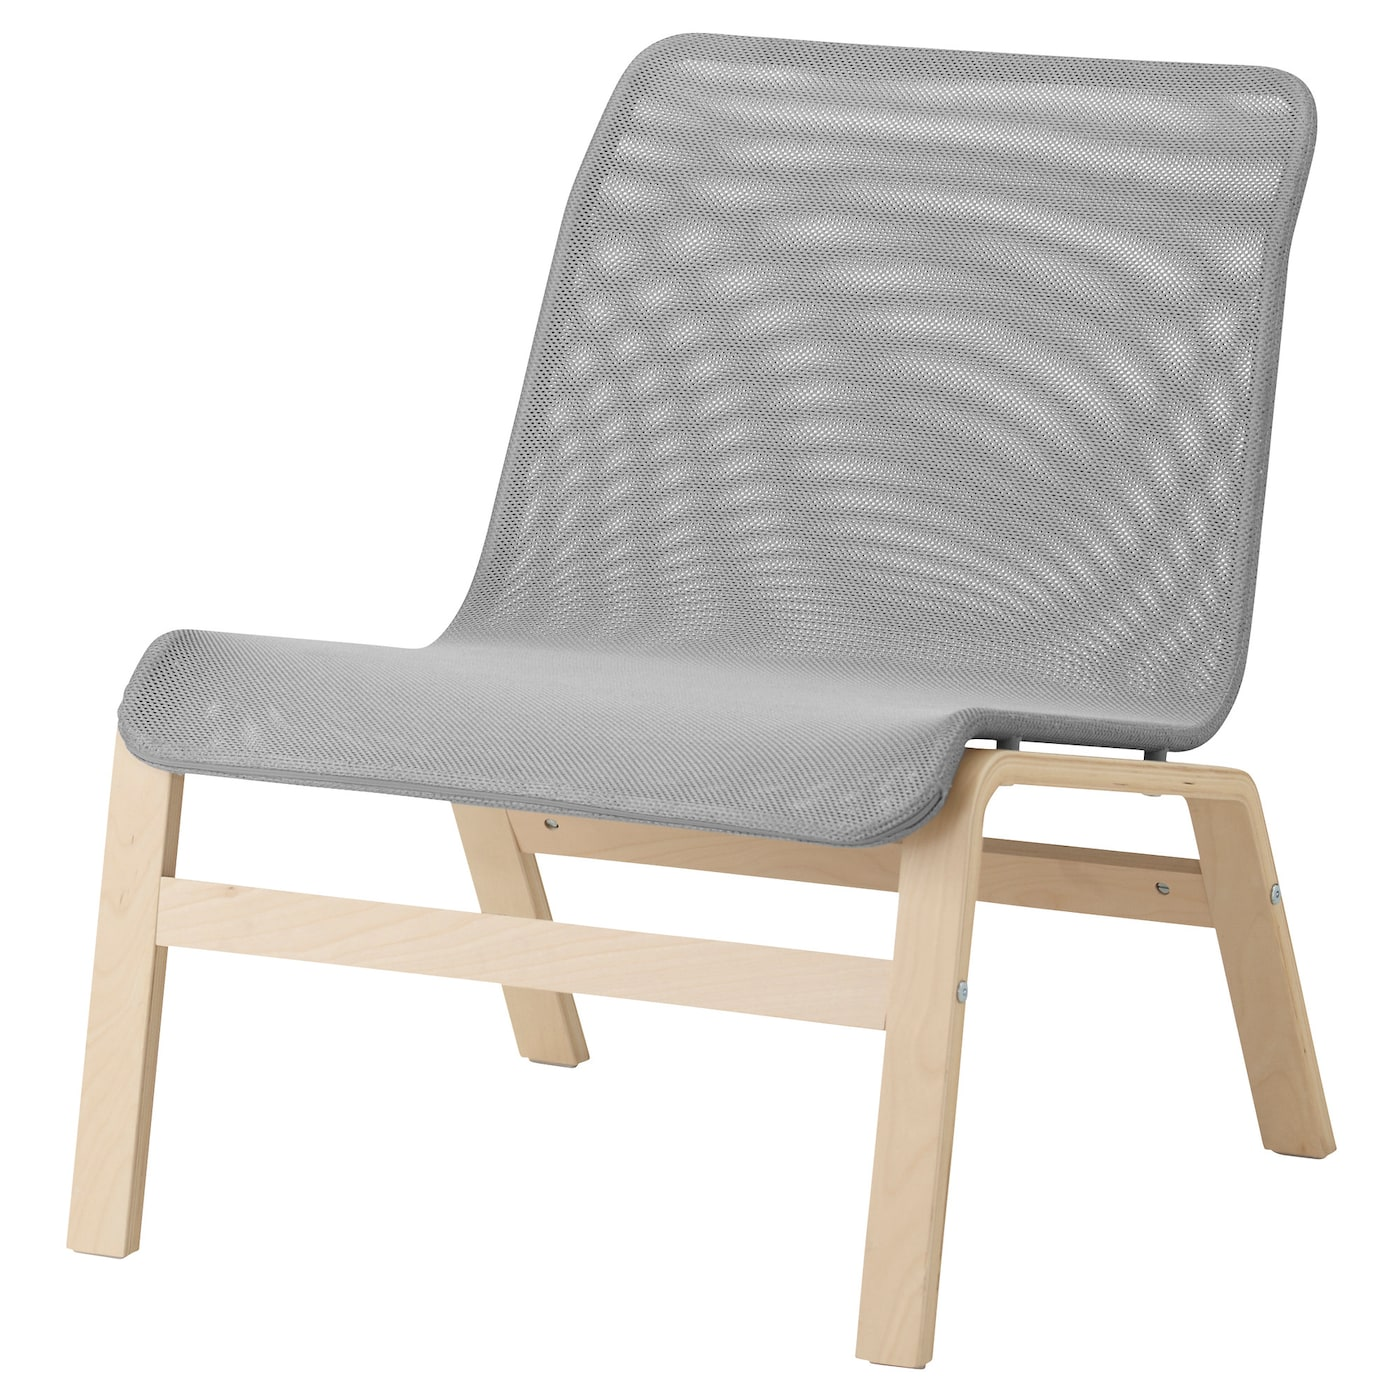 NOLMYRA Chair - birch veneer/gray